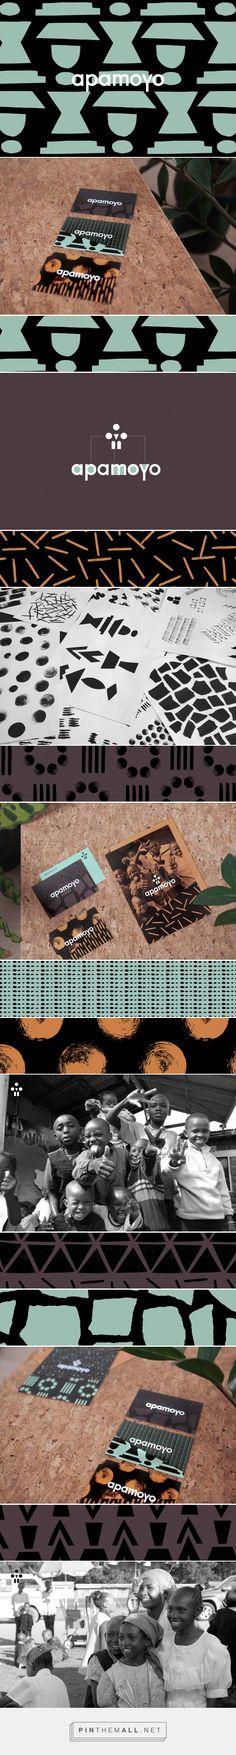 Apamoyo Educational Organization Branding by KittoKatsu GmbH | Fivestar Branding Agency – Design and Branding Agency & Curated Inspiration Gallery